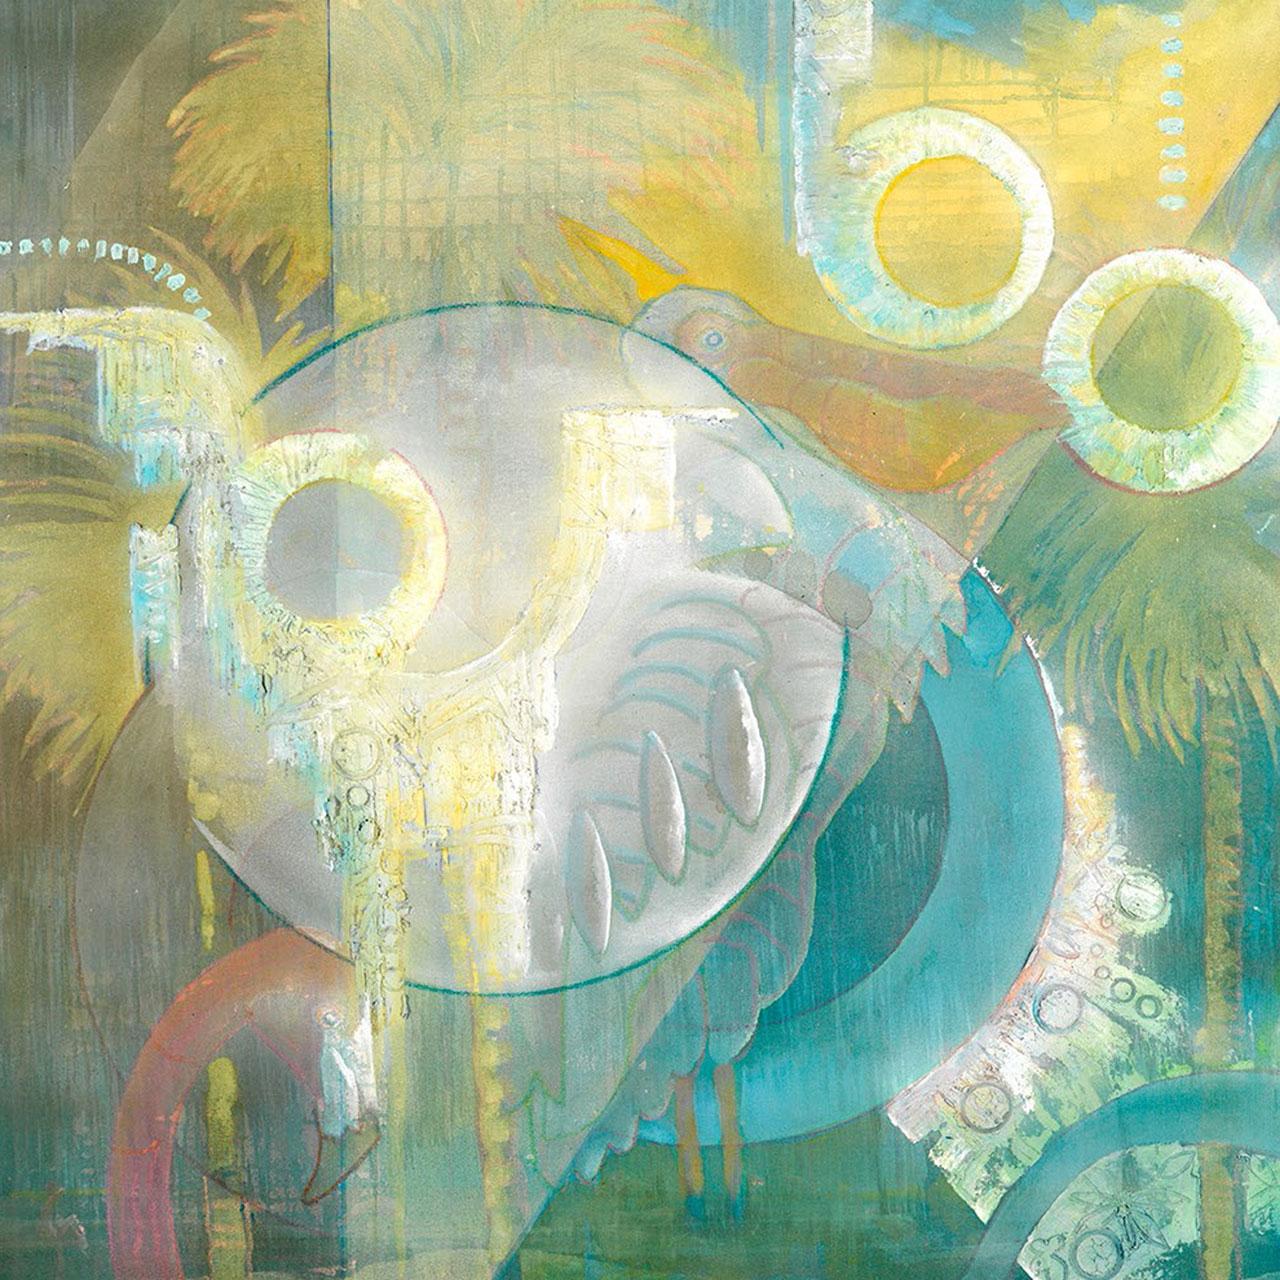 vito loli abstract painting